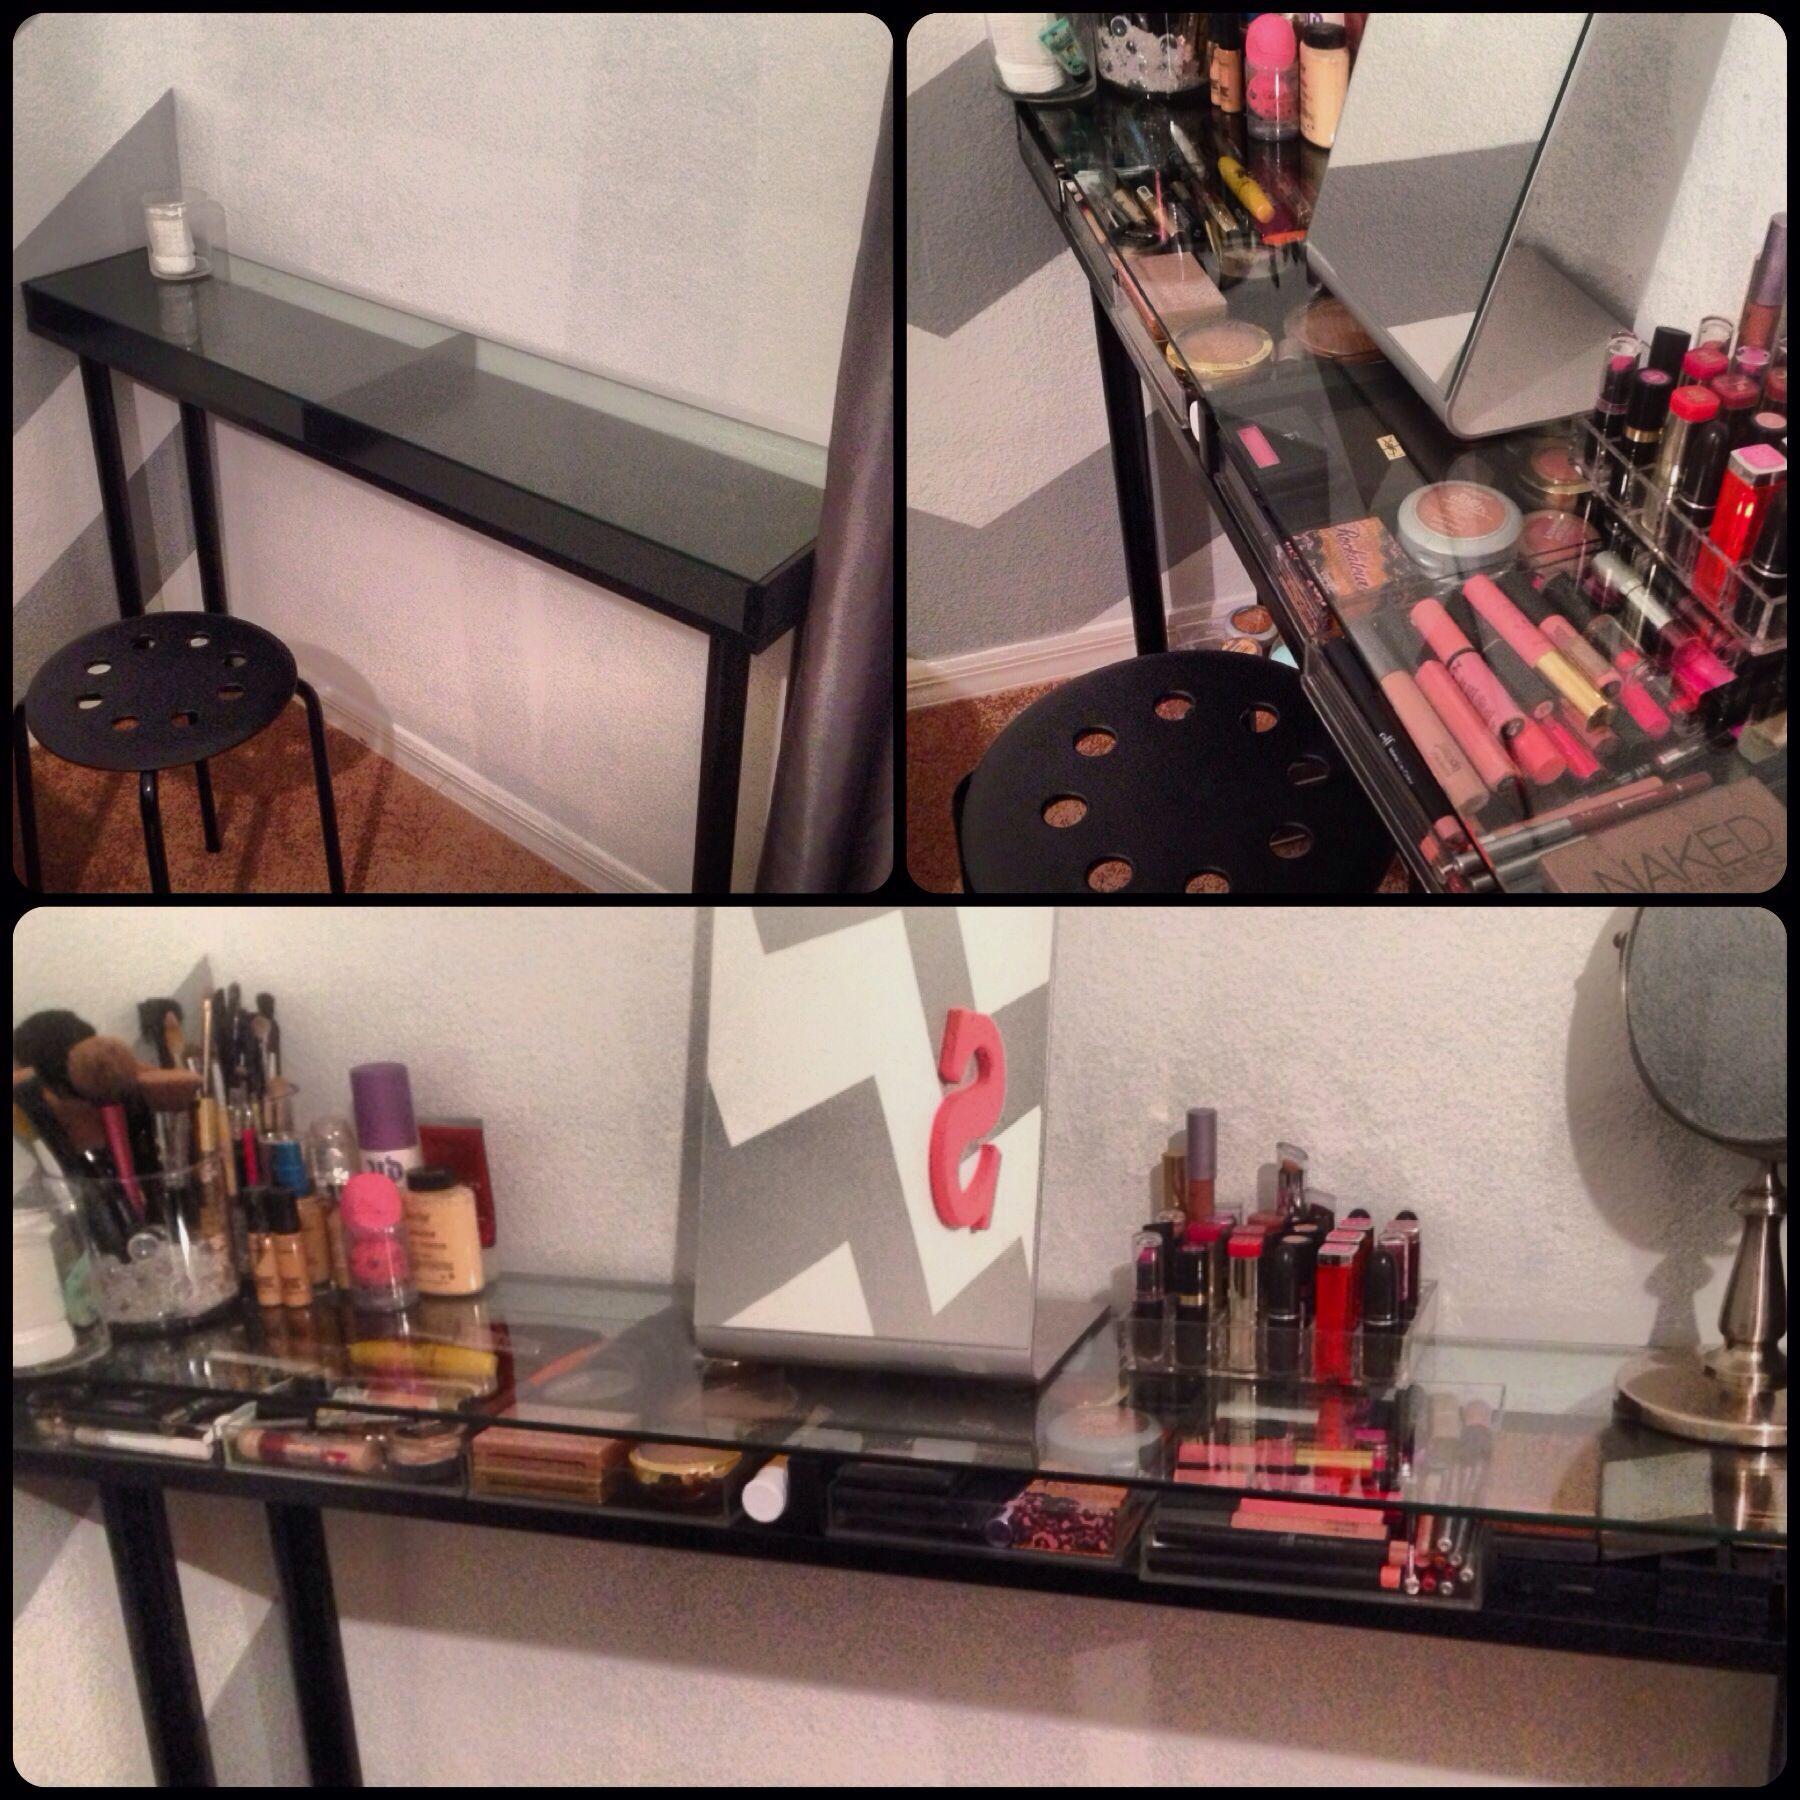 DIY makeup vanity from ikea! Ekby gruvan shelf that I